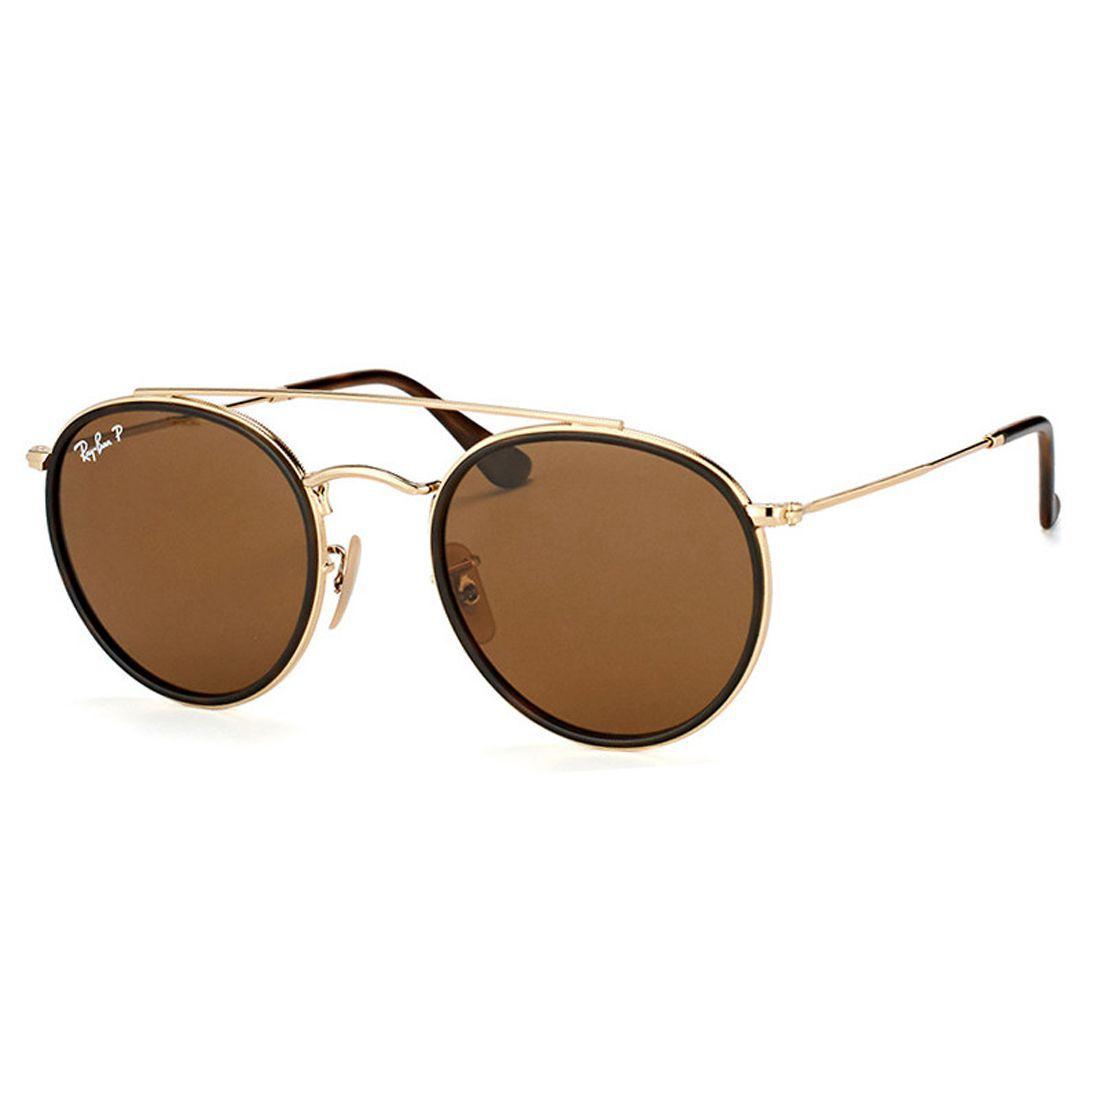 27b9f6a68 Óculos Rayban Modelo Double Brigde Marrom Original